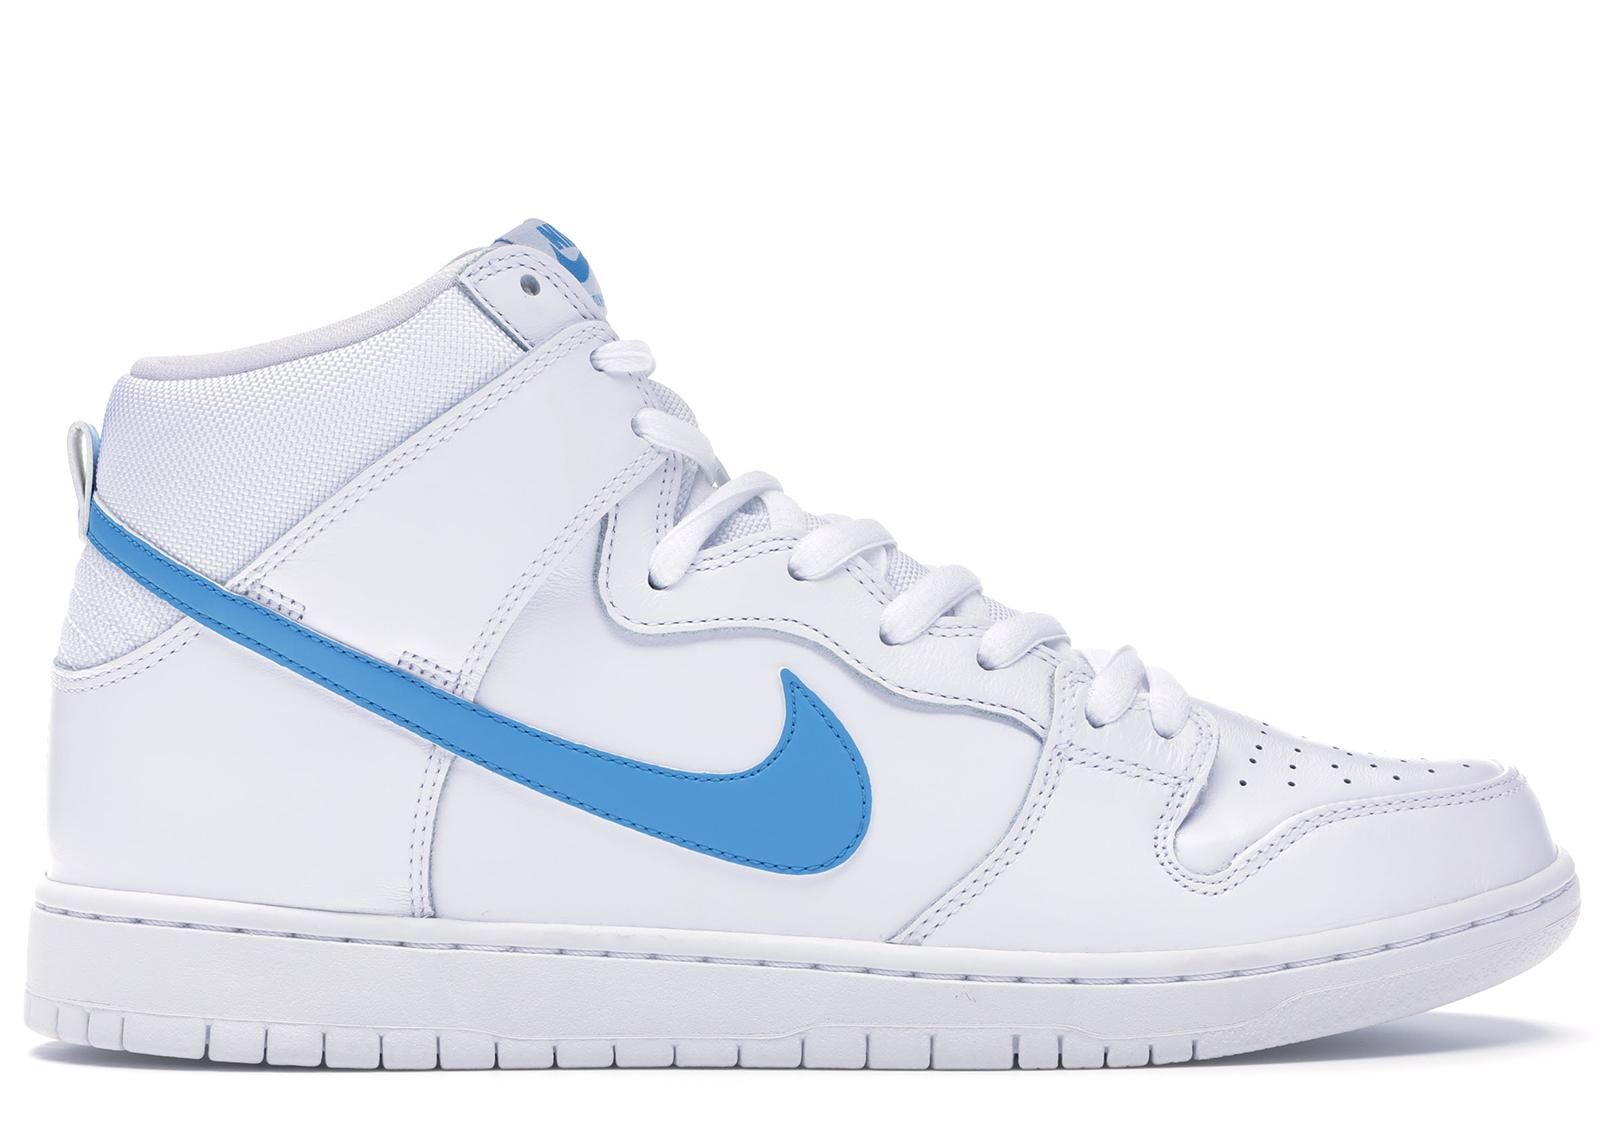 Nike SB Dunk High Mulder - 881758-141